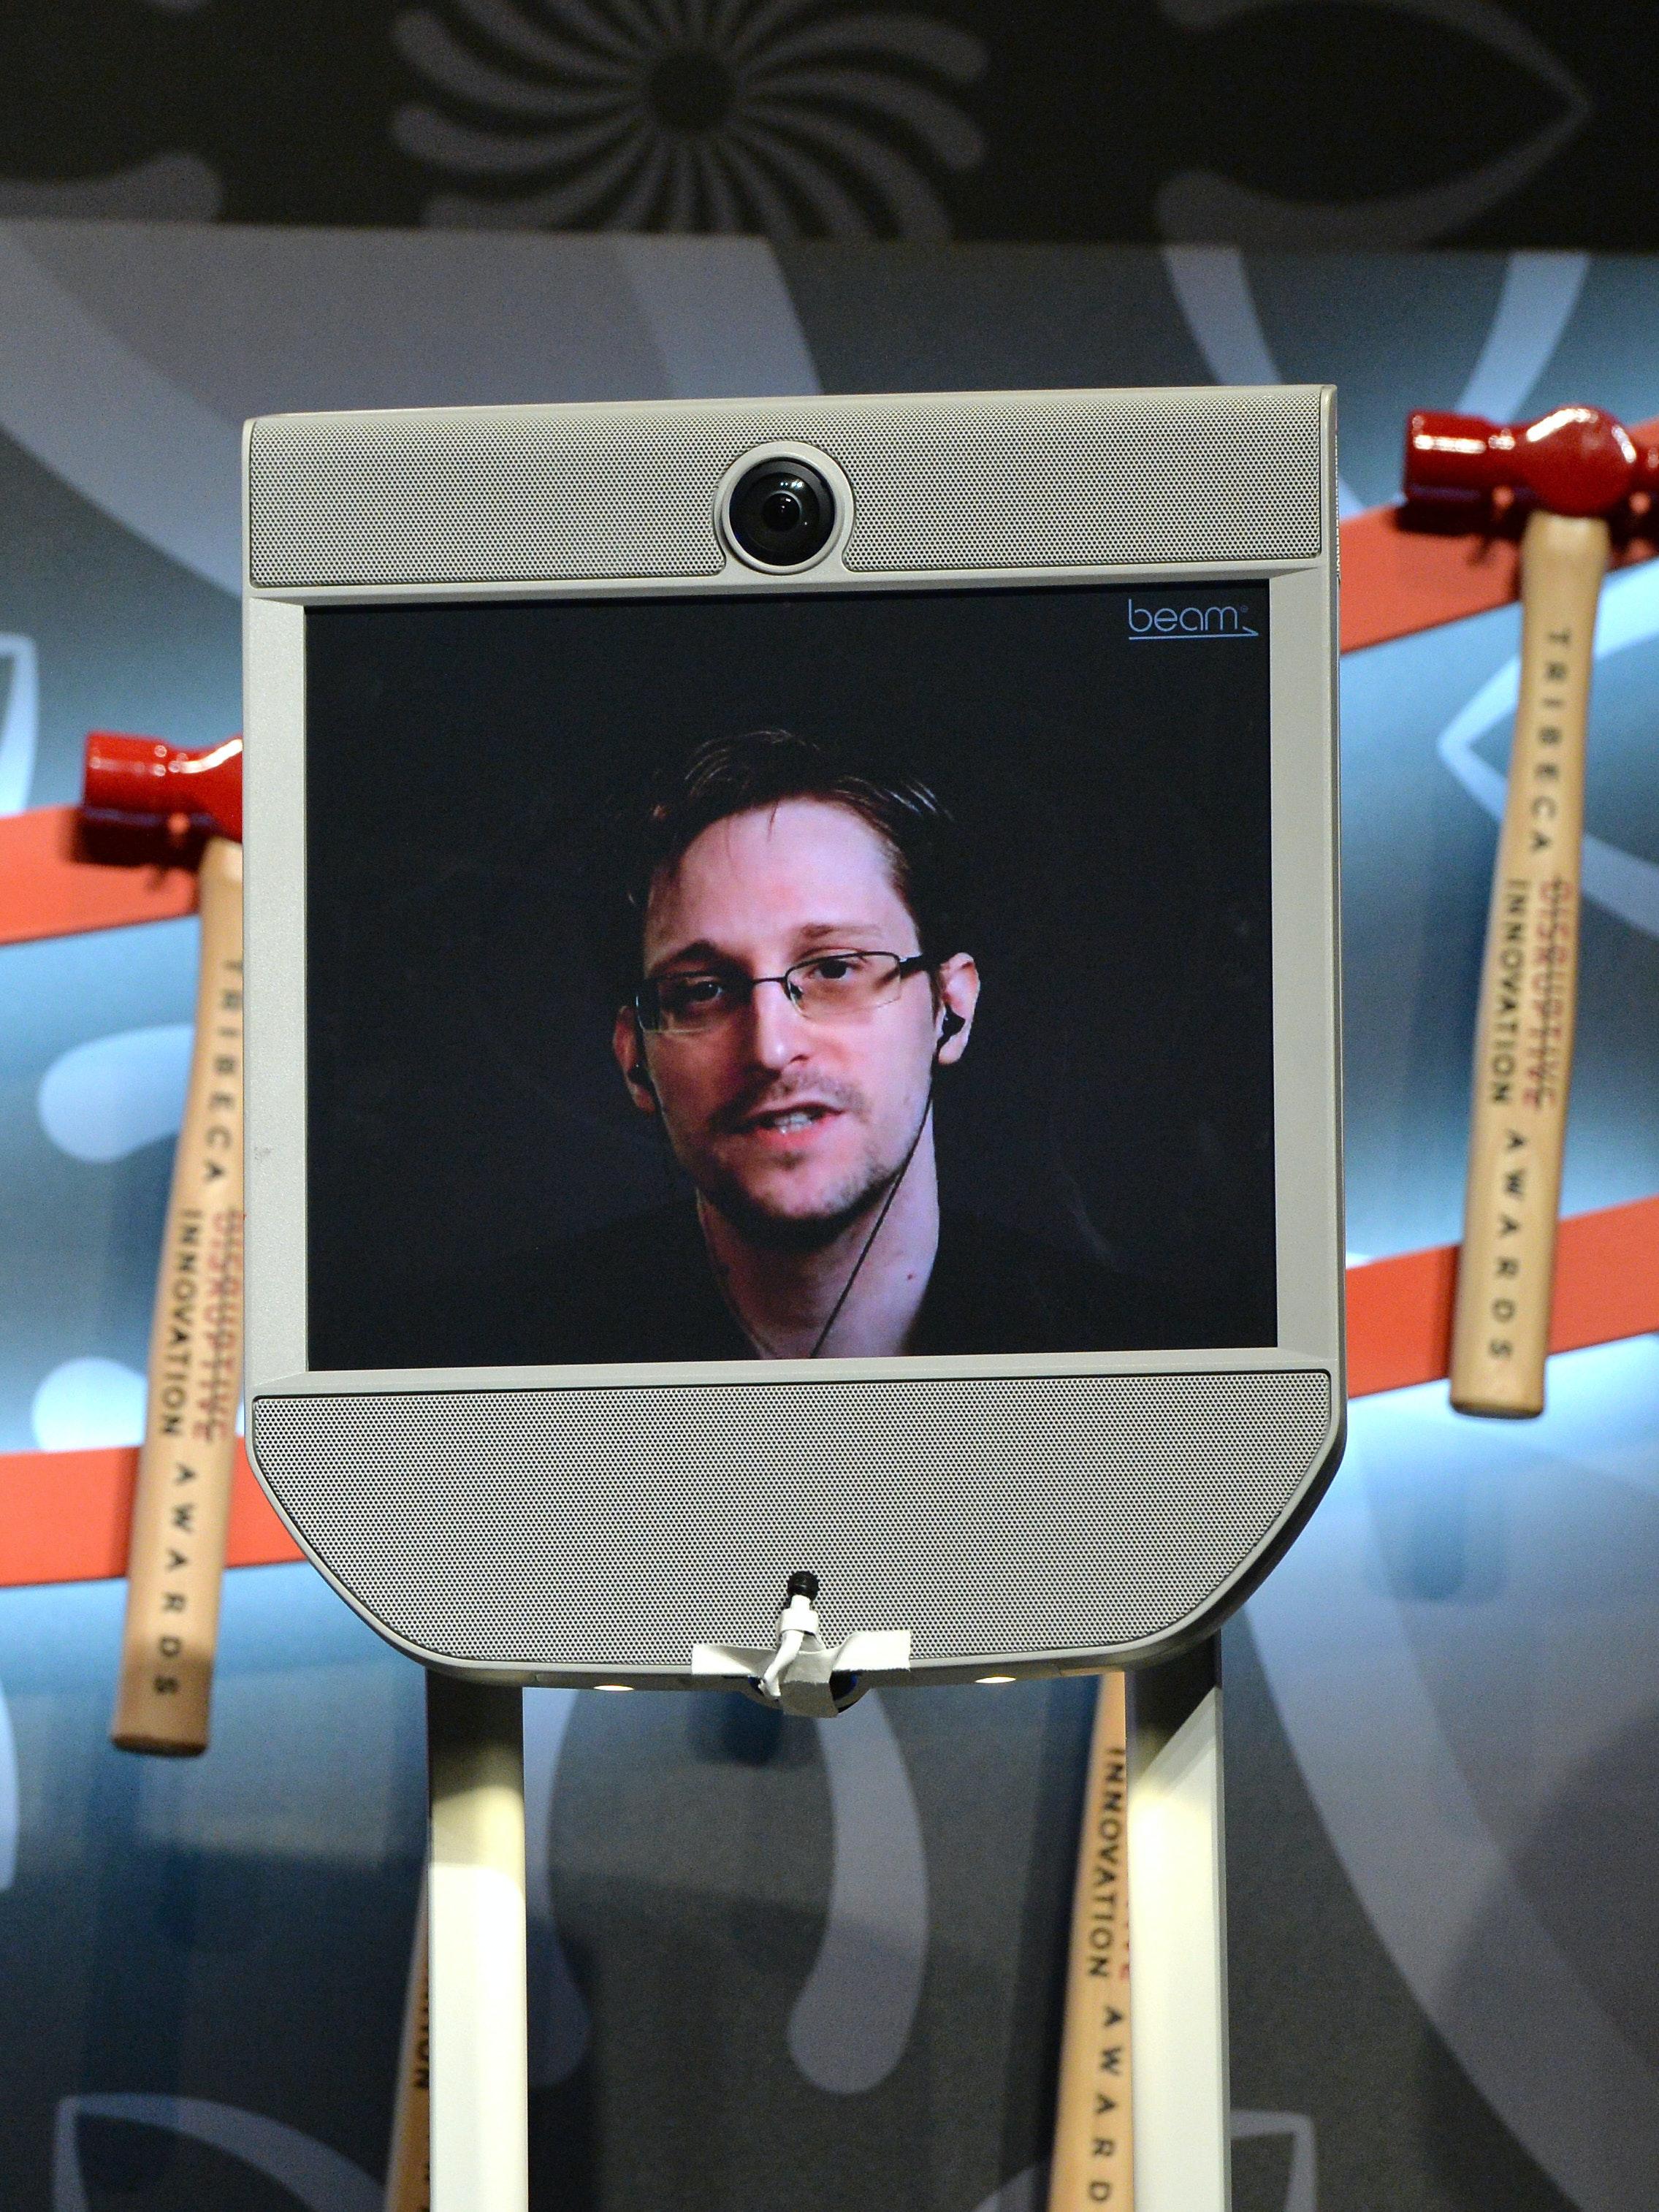 NEW YORK, NY - APRIL 22:  Edward Snowden (via monitor) speaks on stage at Tribeca Disruptive Innovation Awards - 2016 Tribeca Film Festival at BMCC John Zuccotti Theater on April 22, 2016 in New York City.  (Photo by Slaven Vlasic/Getty Images for Tribeca Film Festival)